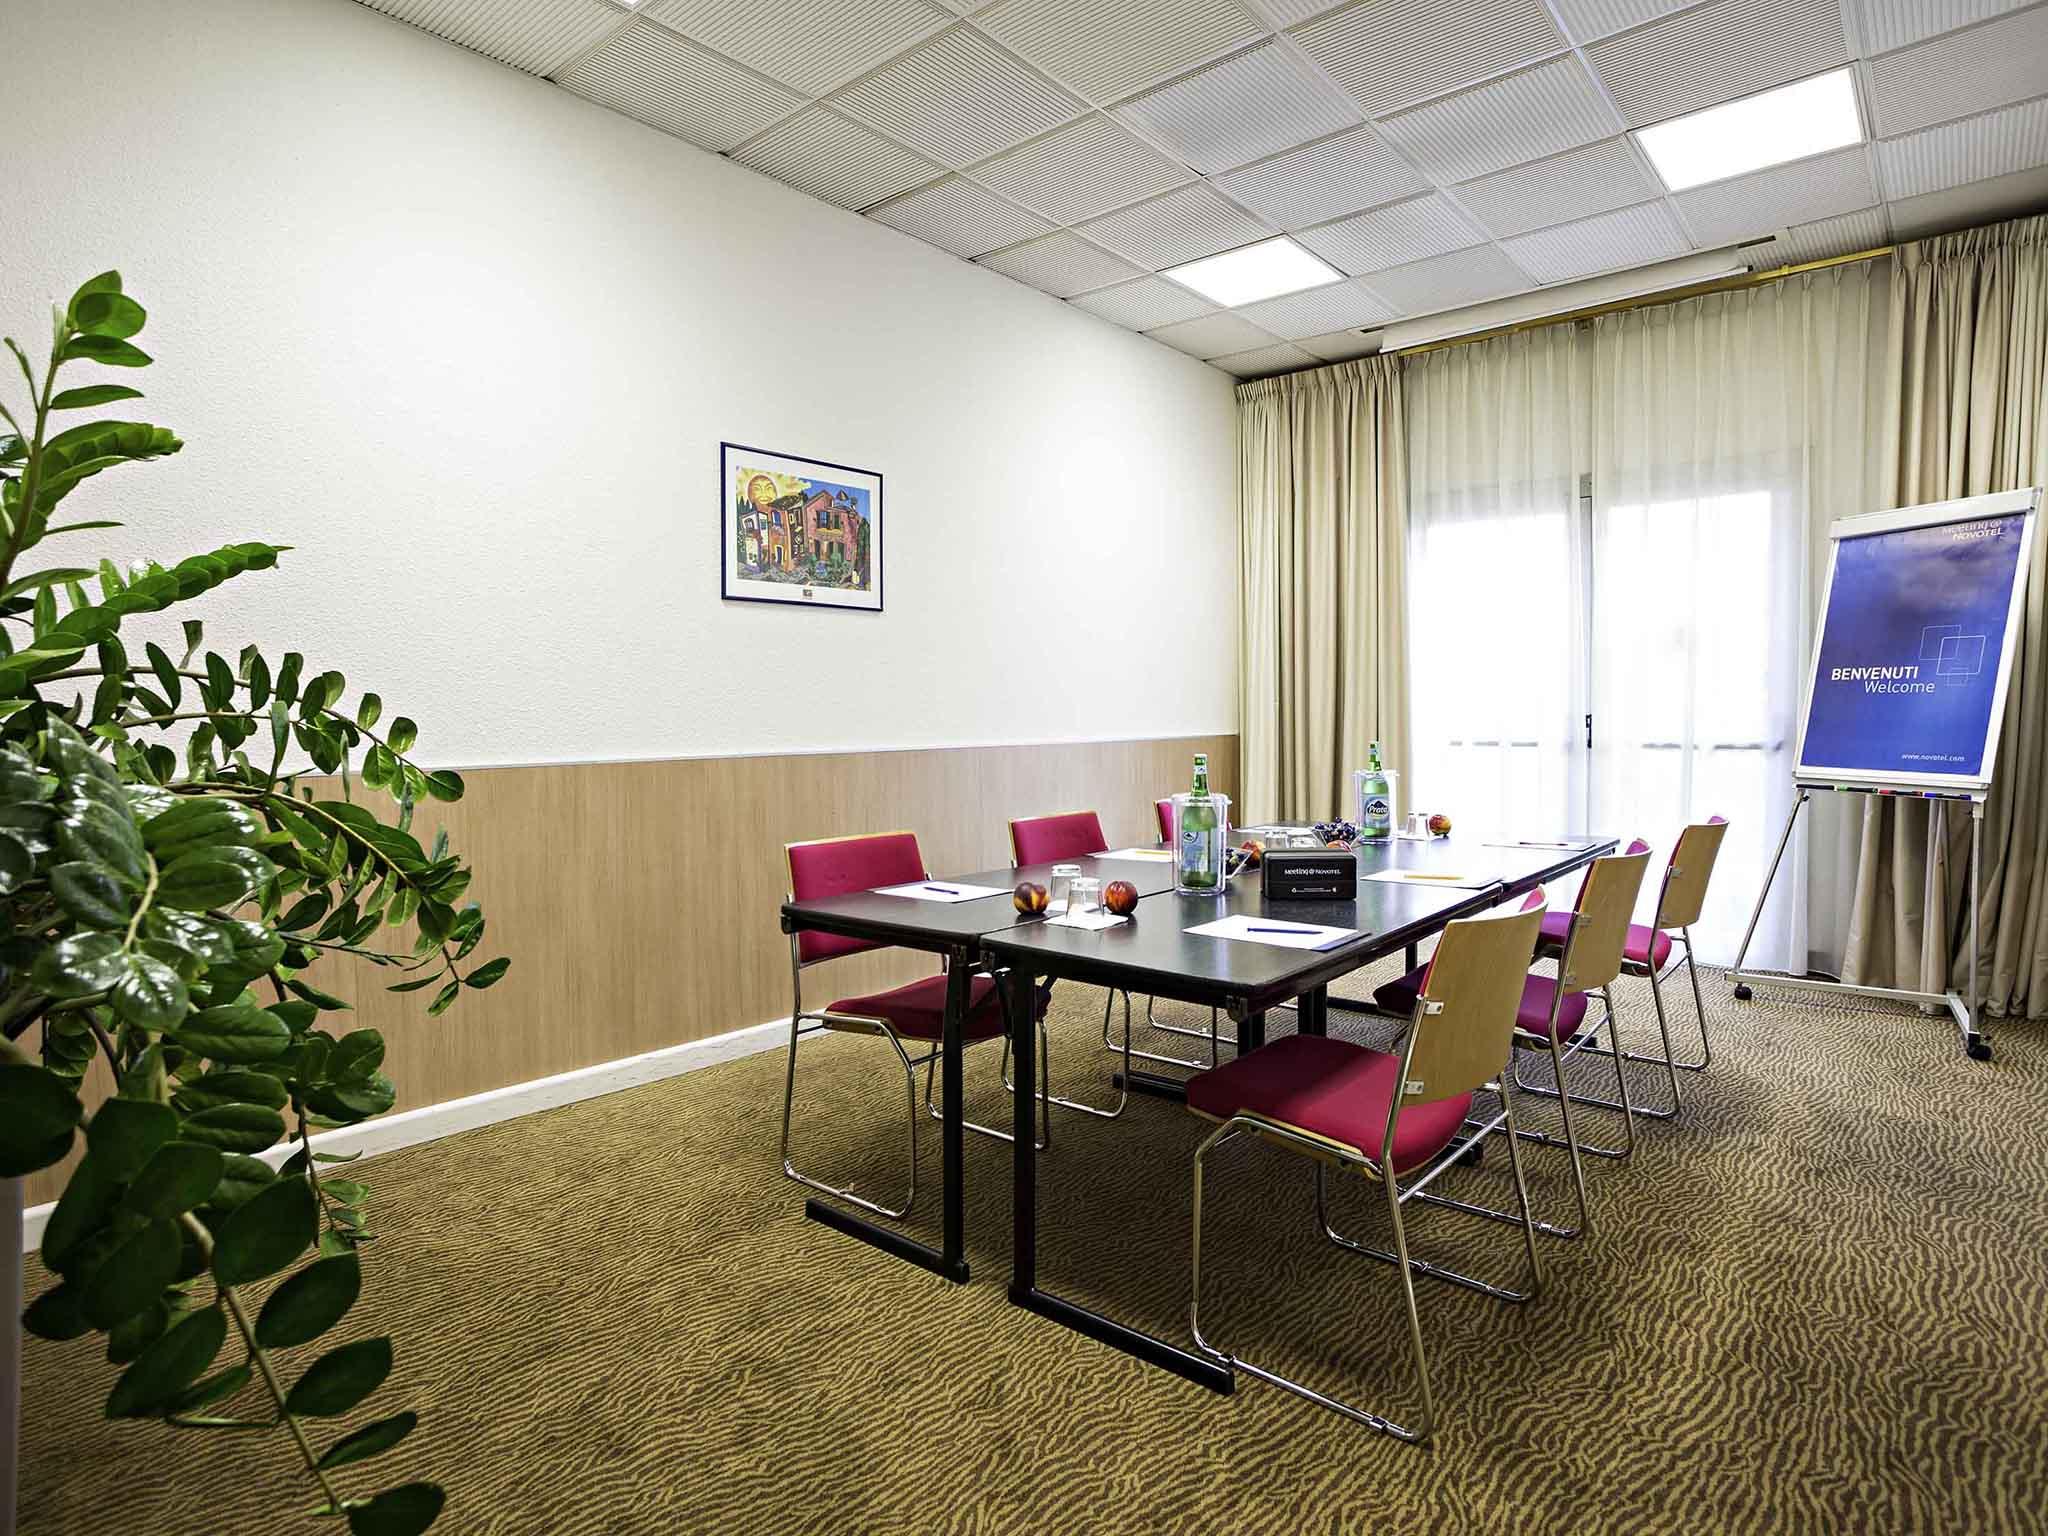 Hotel in Capodrise - Novotel Caserta Sud